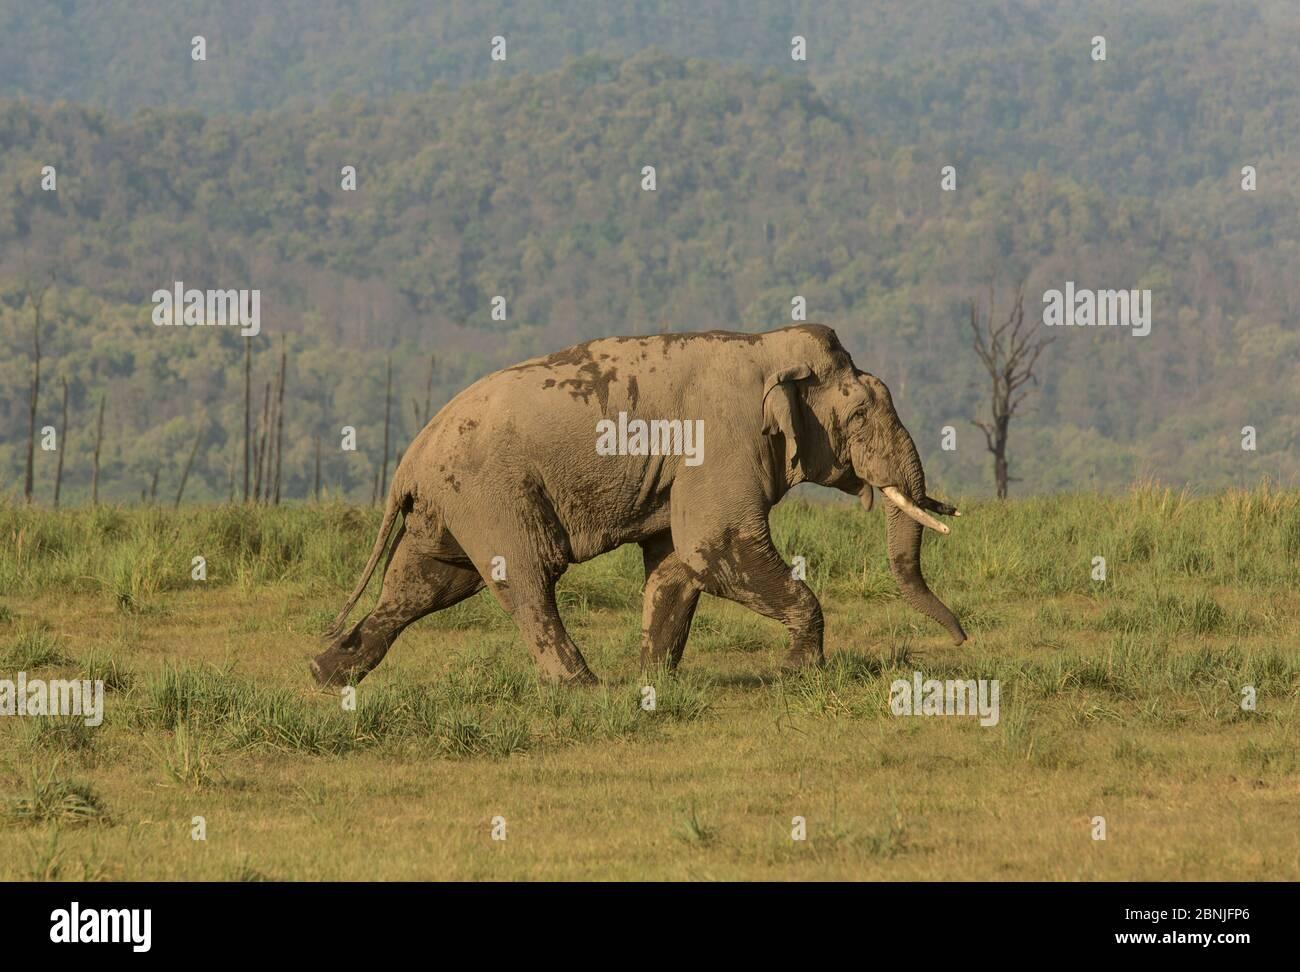 Asiatic elephant (Elephas maximus) male aggressively walking towards rival male. Jim Corbett National Park, India. Stock Photo